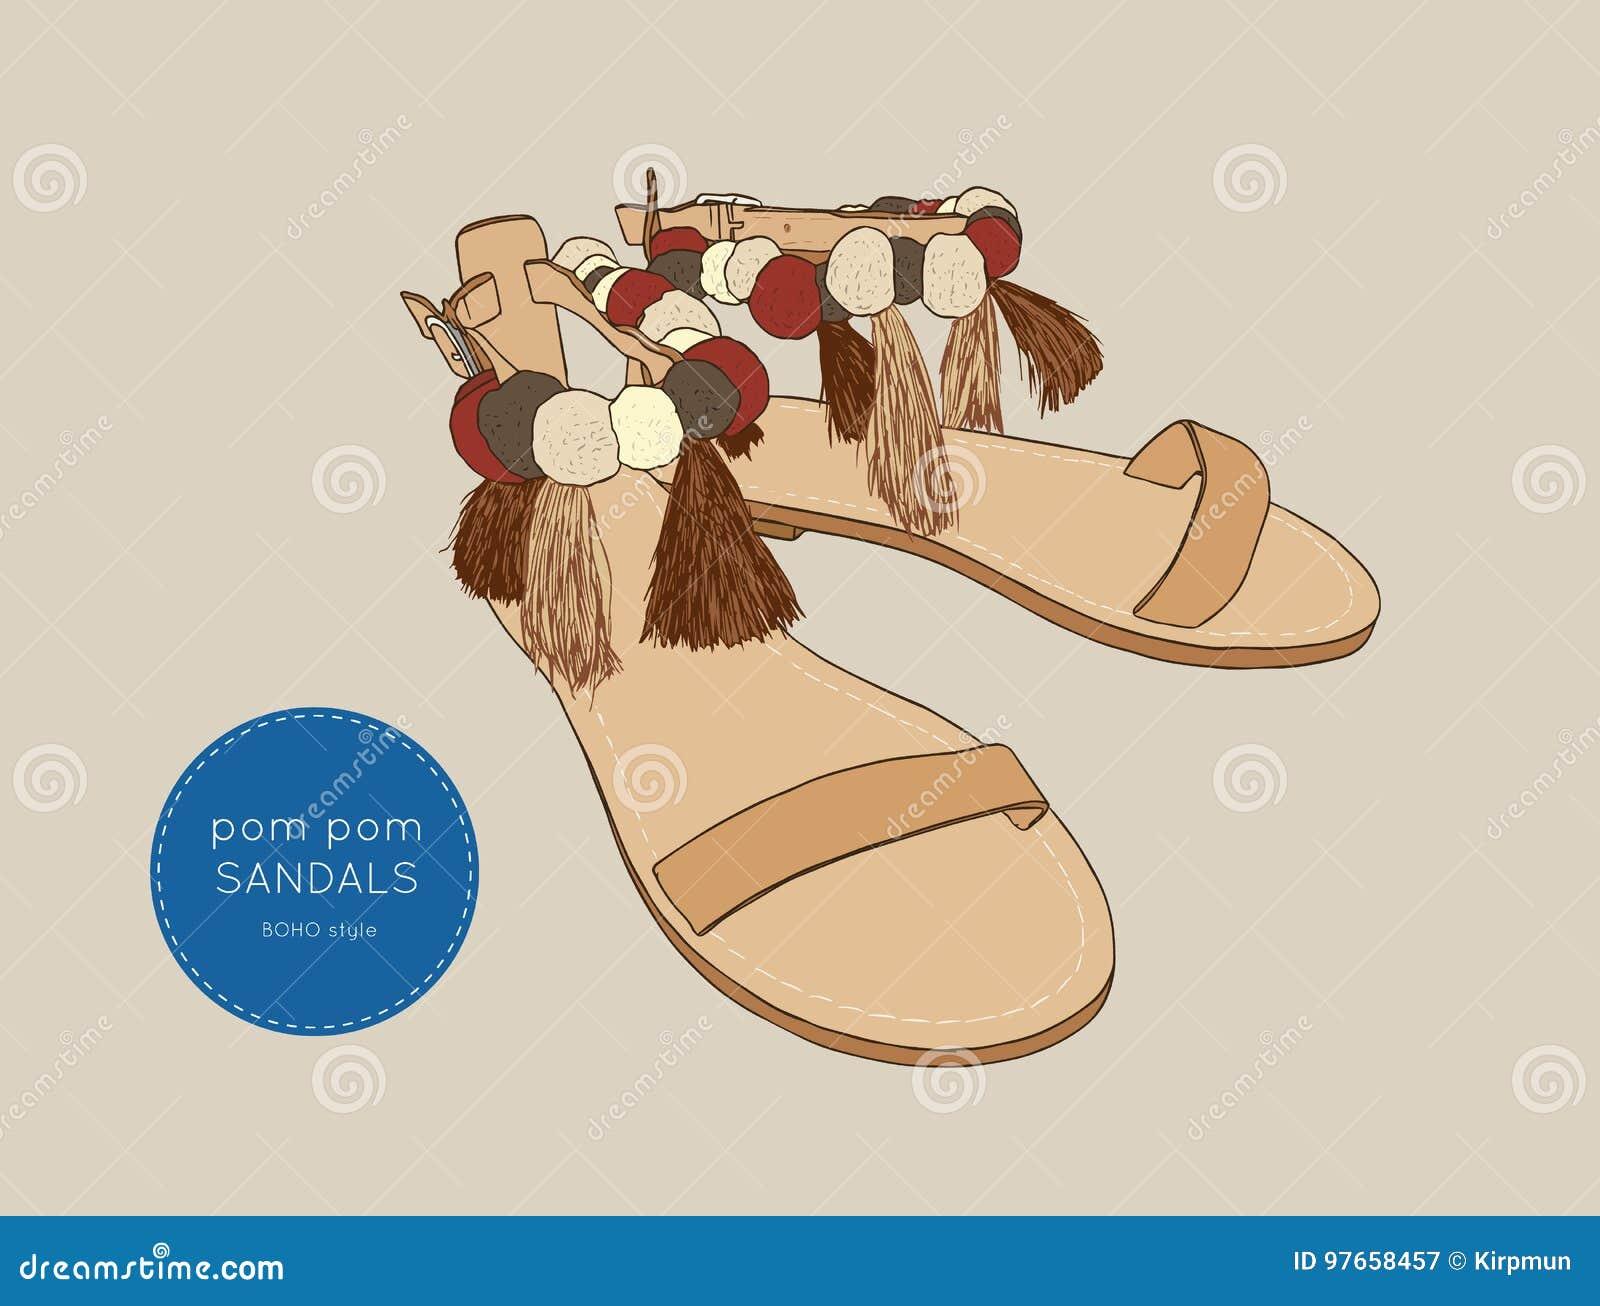 e781c9aa1472 Pom Pom Sandals Bohemian Fashion Style Vector. Stock Vector ...